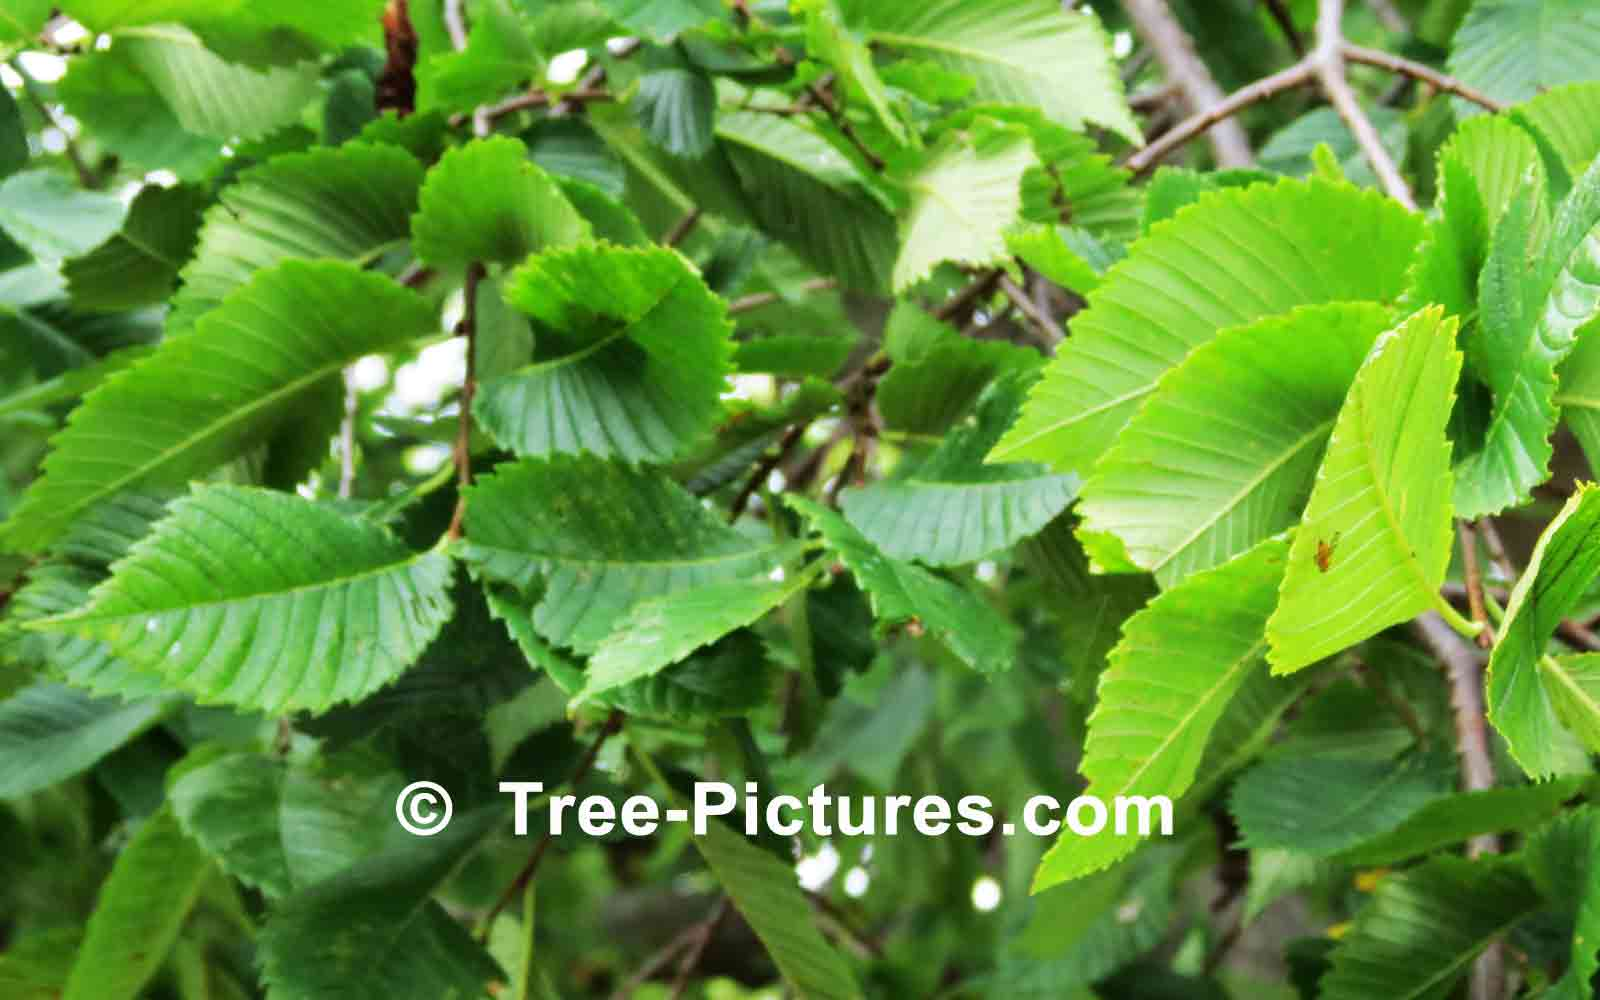 elm tree pictures images u0026 photos